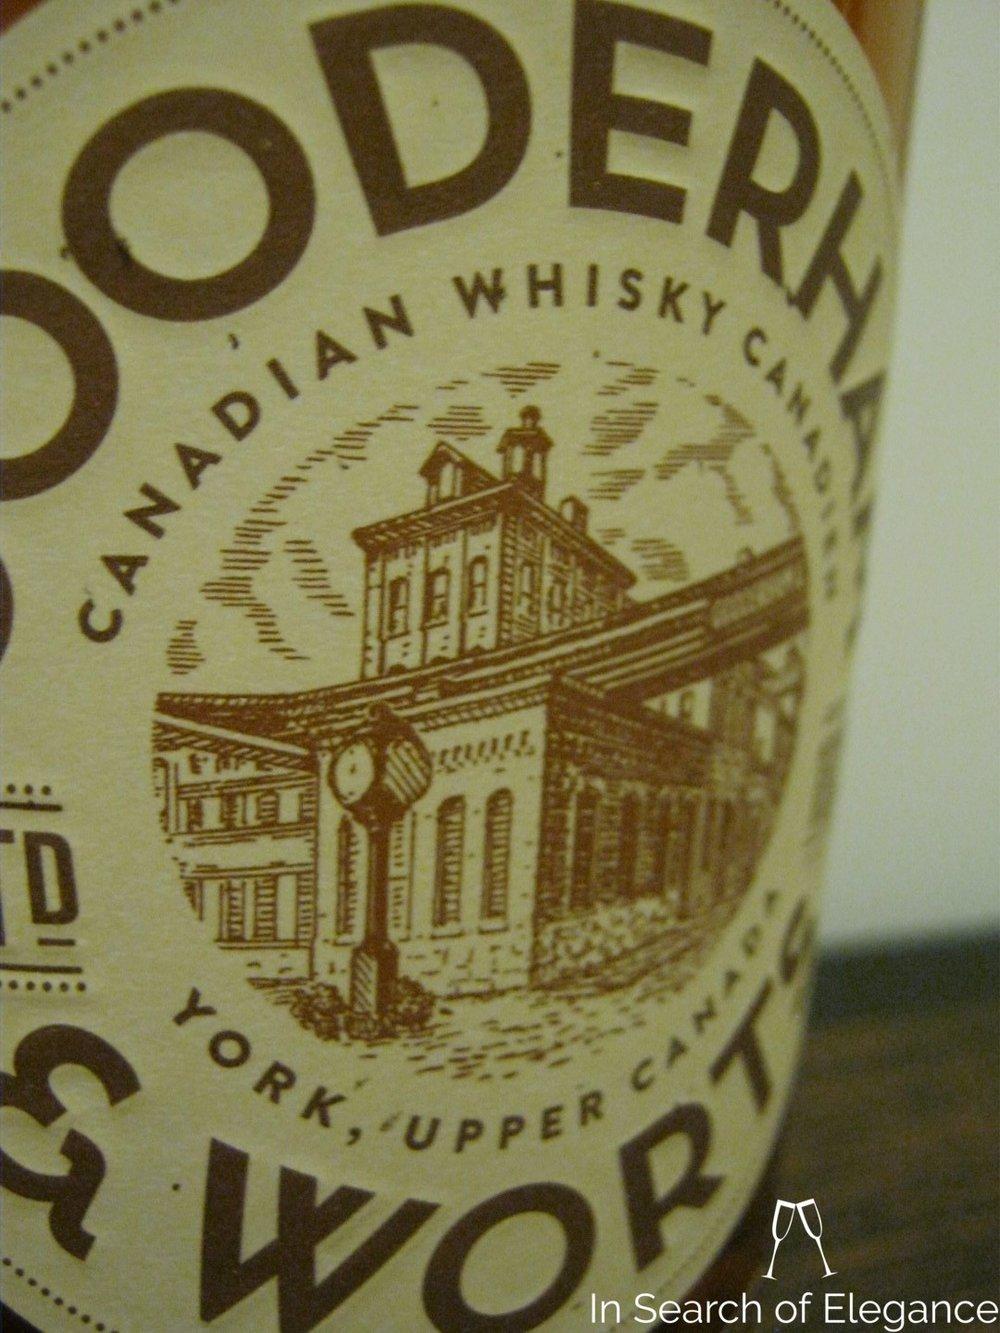 Gooderham 2.jpg